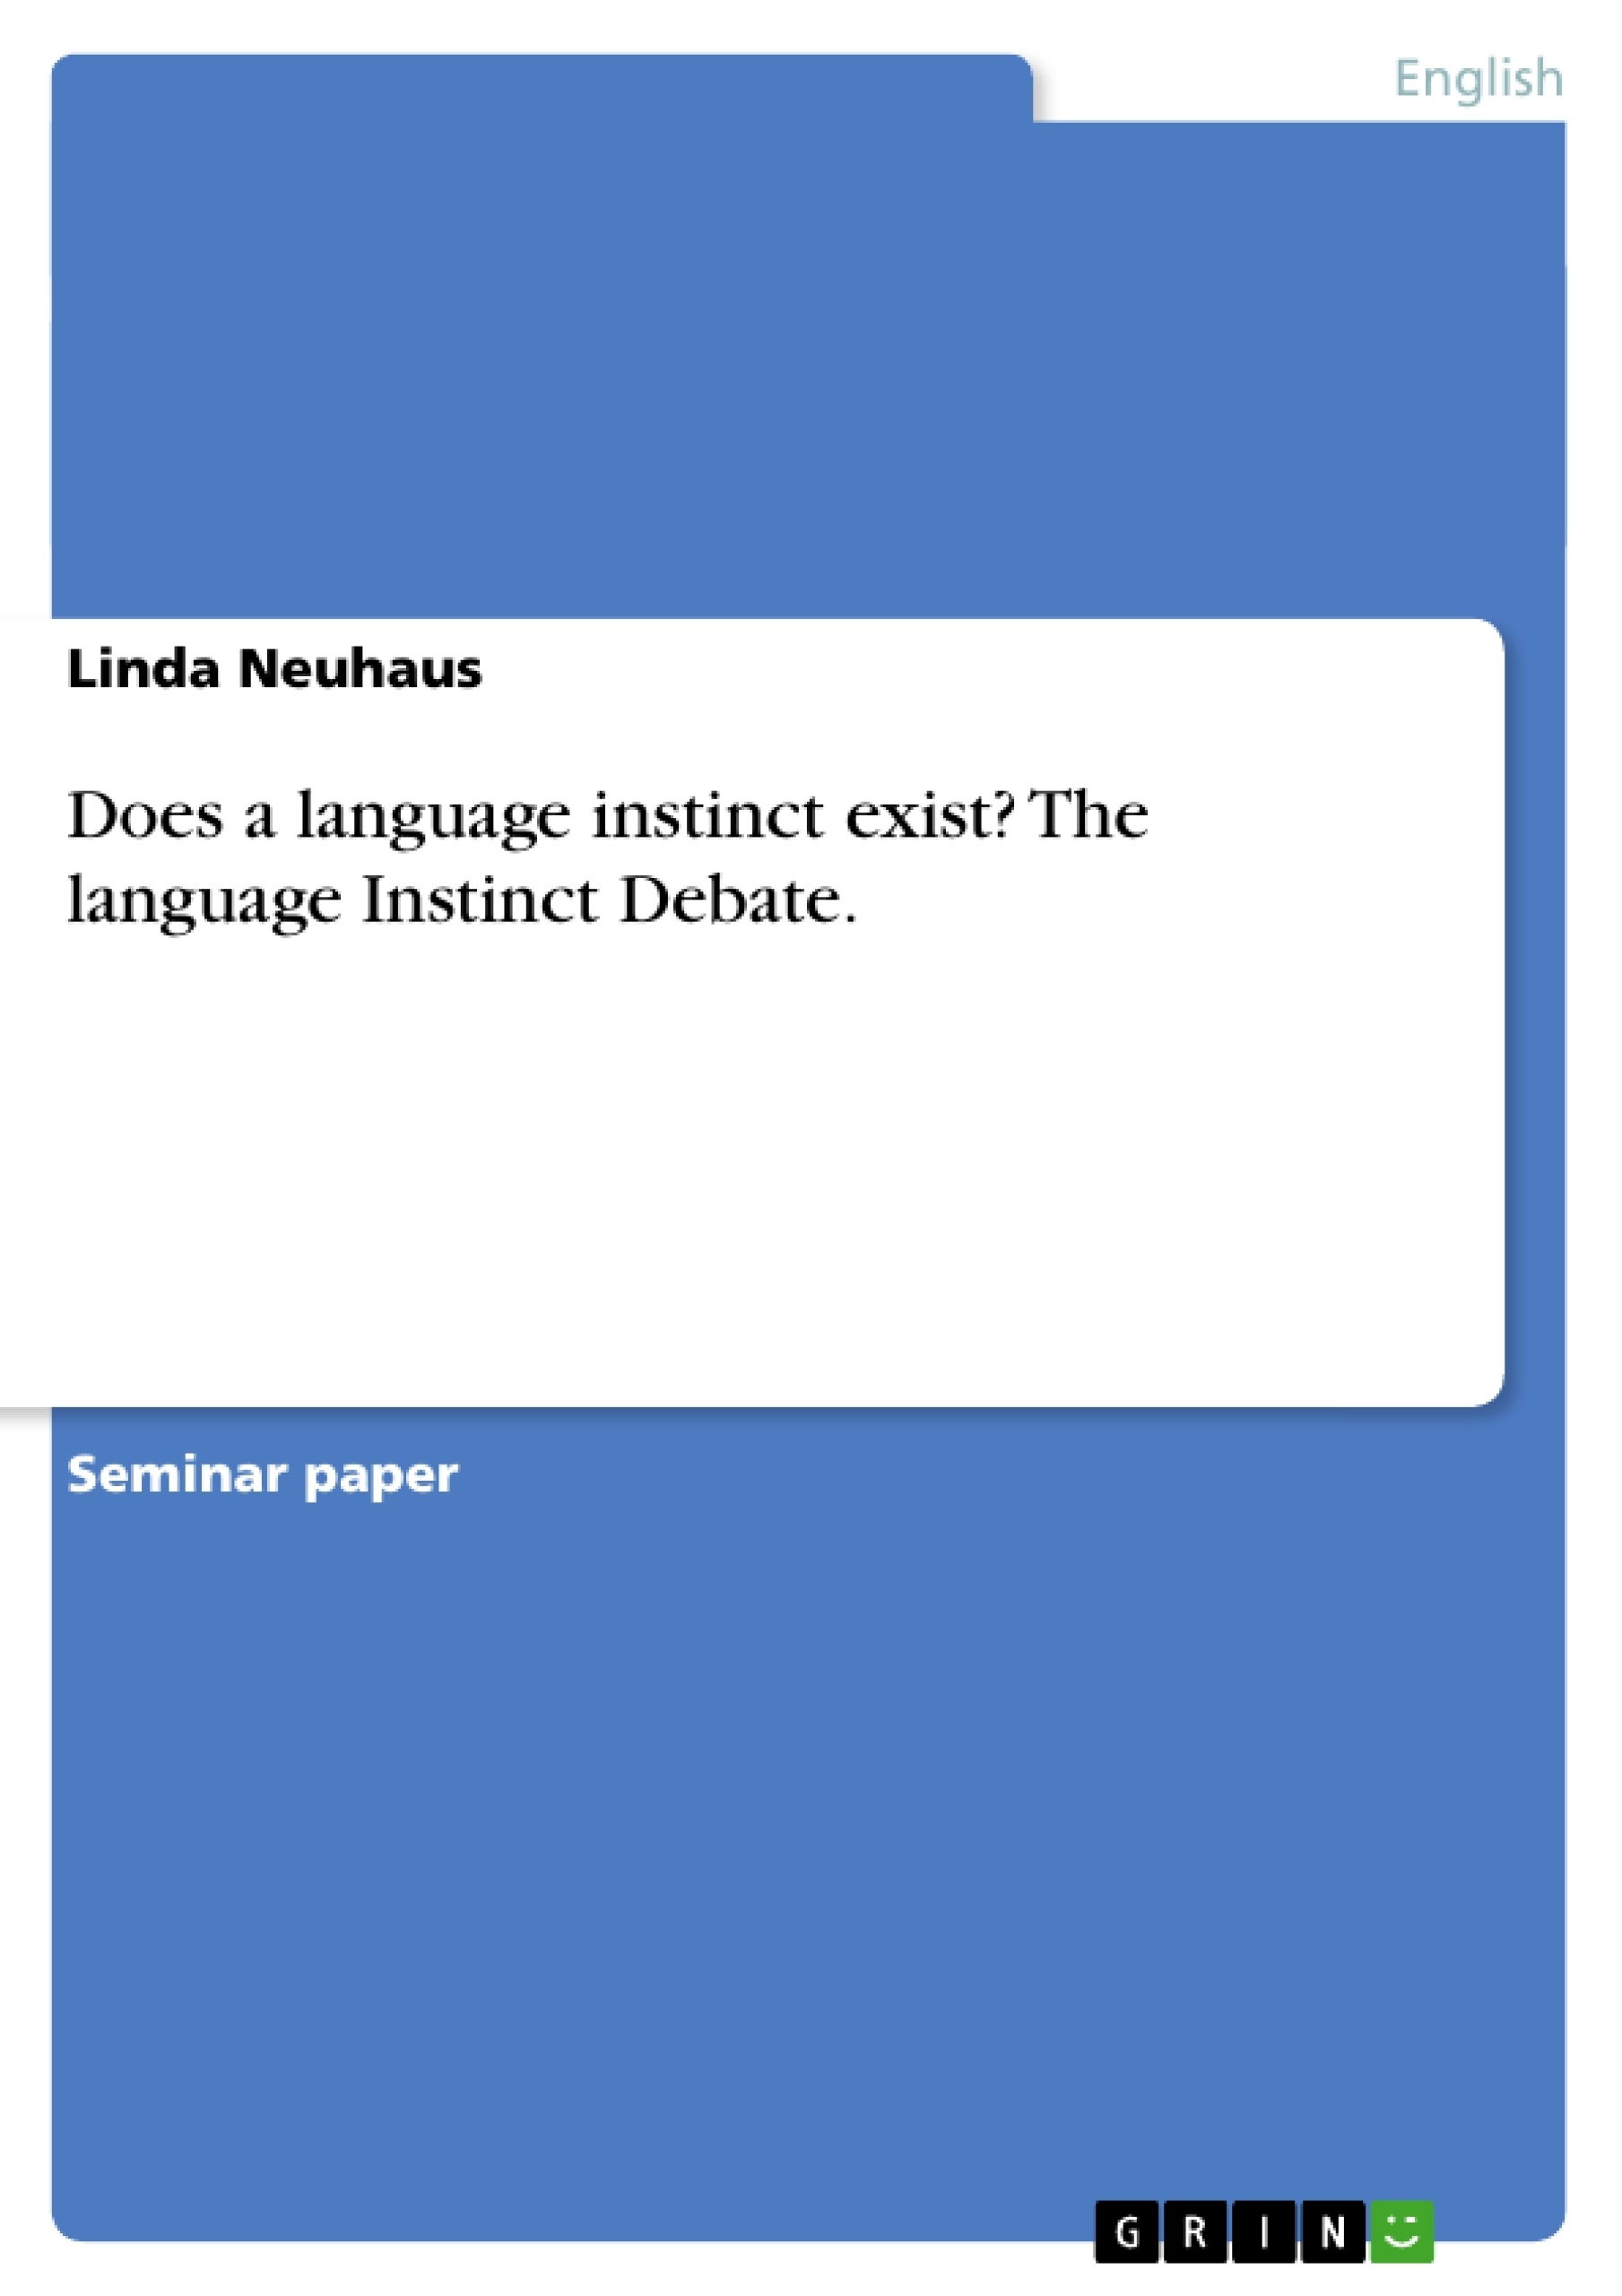 Title: Does a language instinct exist? The language Instinct Debate.